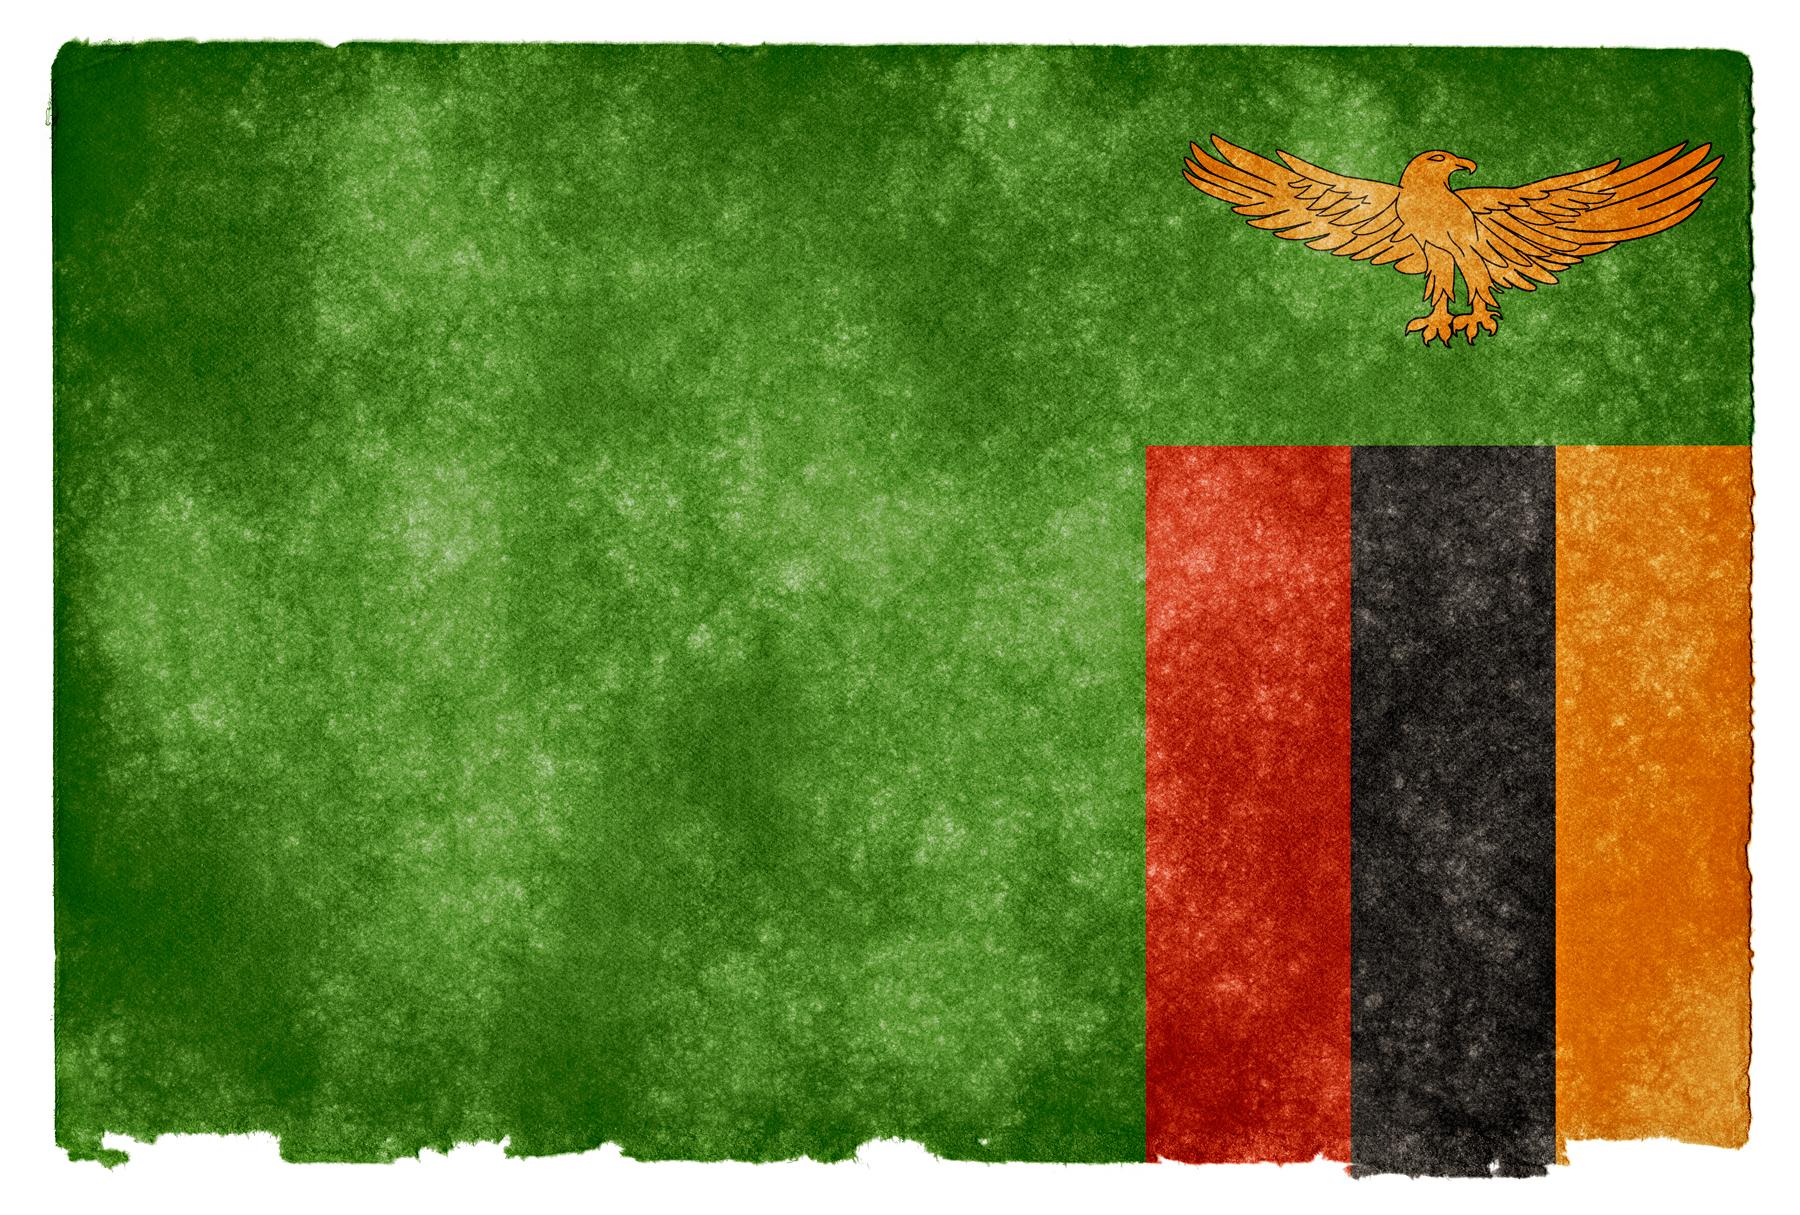 Zambia Grunge Flag, Africa, Resource, Old, Orange, HQ Photo